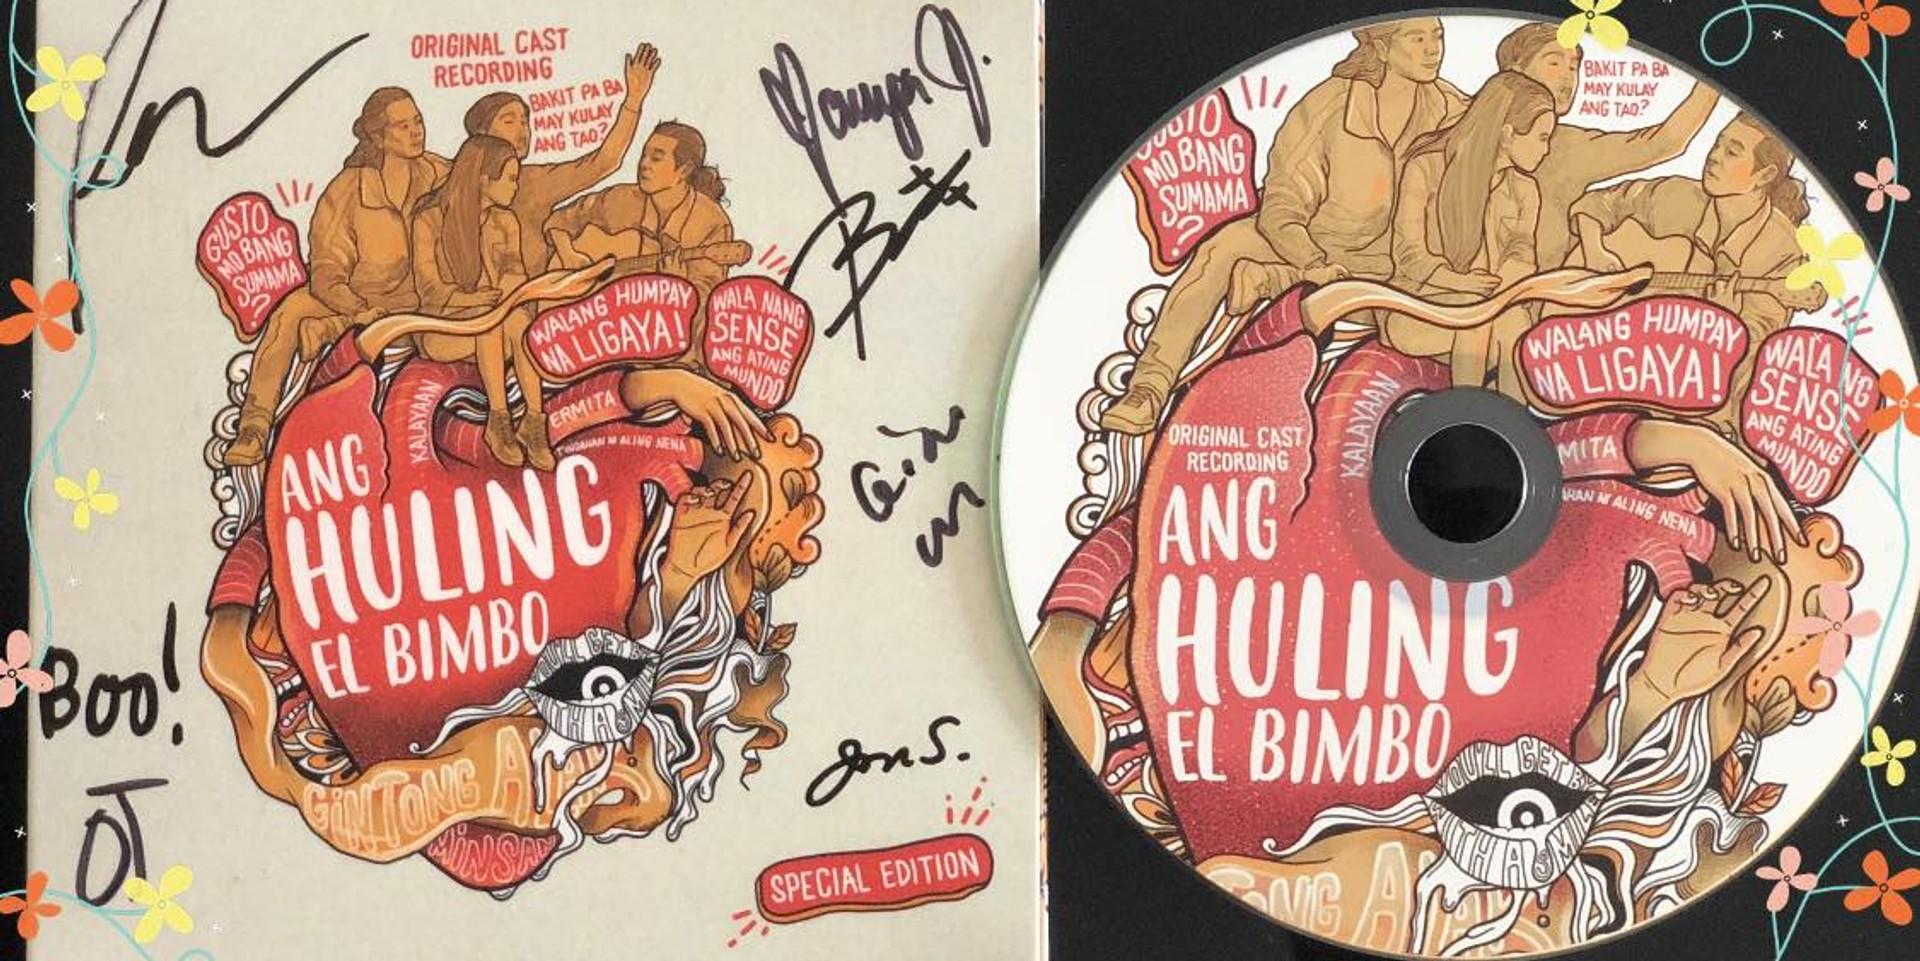 Ang Huling El Bimbo the Musical to release original cast recording